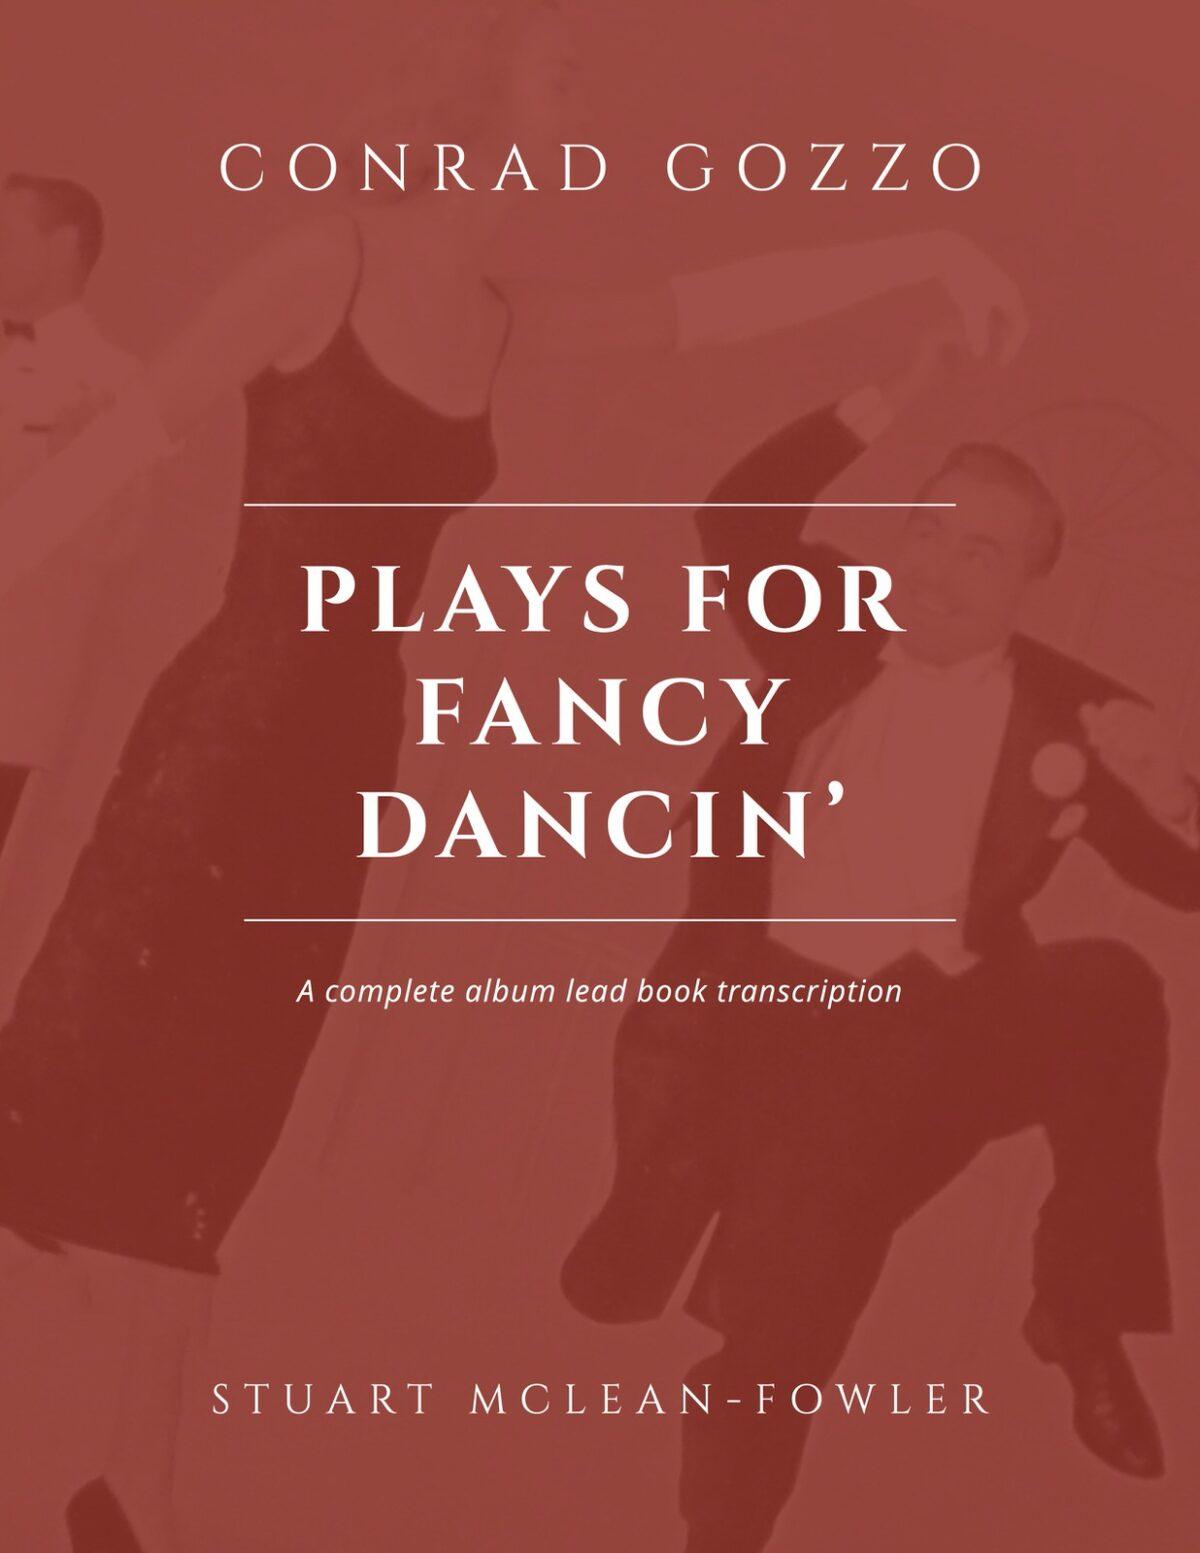 Gozzo, Plays for Fancy Dancin' (Lead Book)-p01